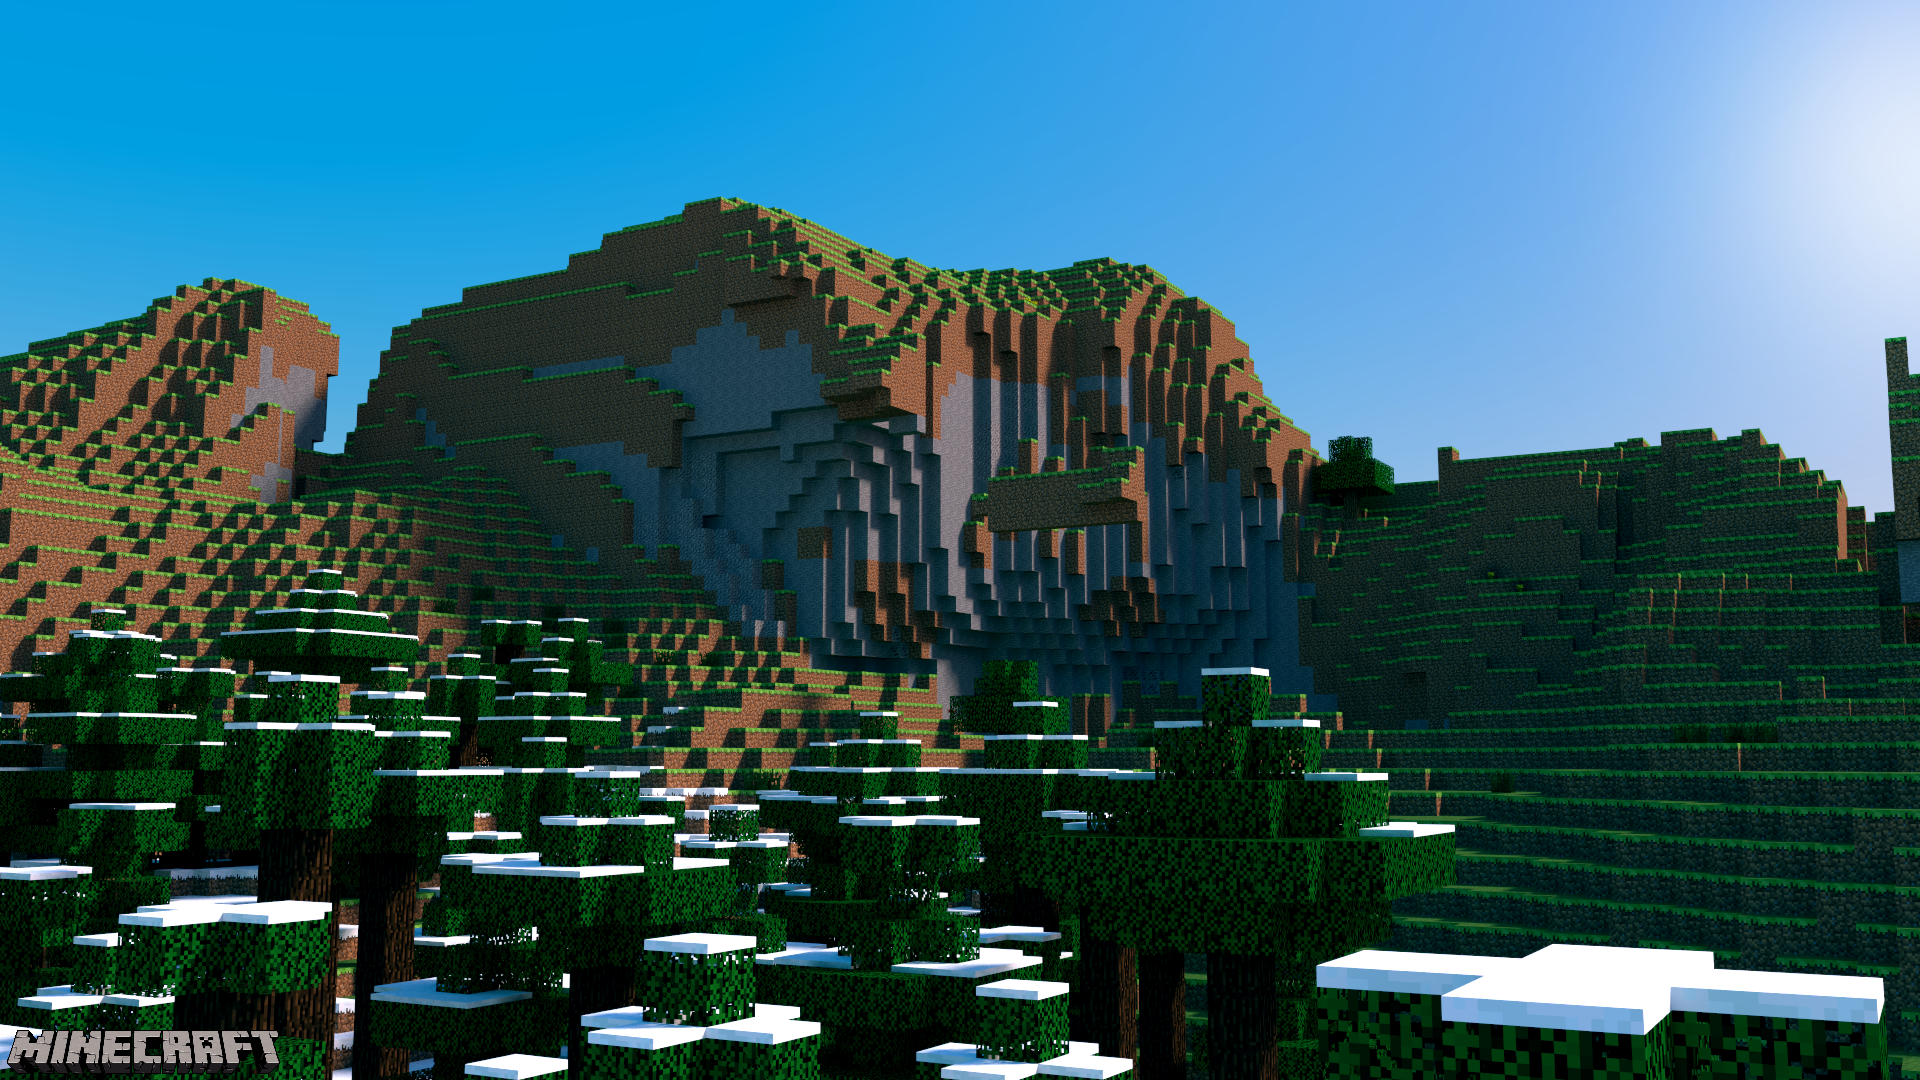 Minecraft Desktop - The Mountains by PerpetualStudios